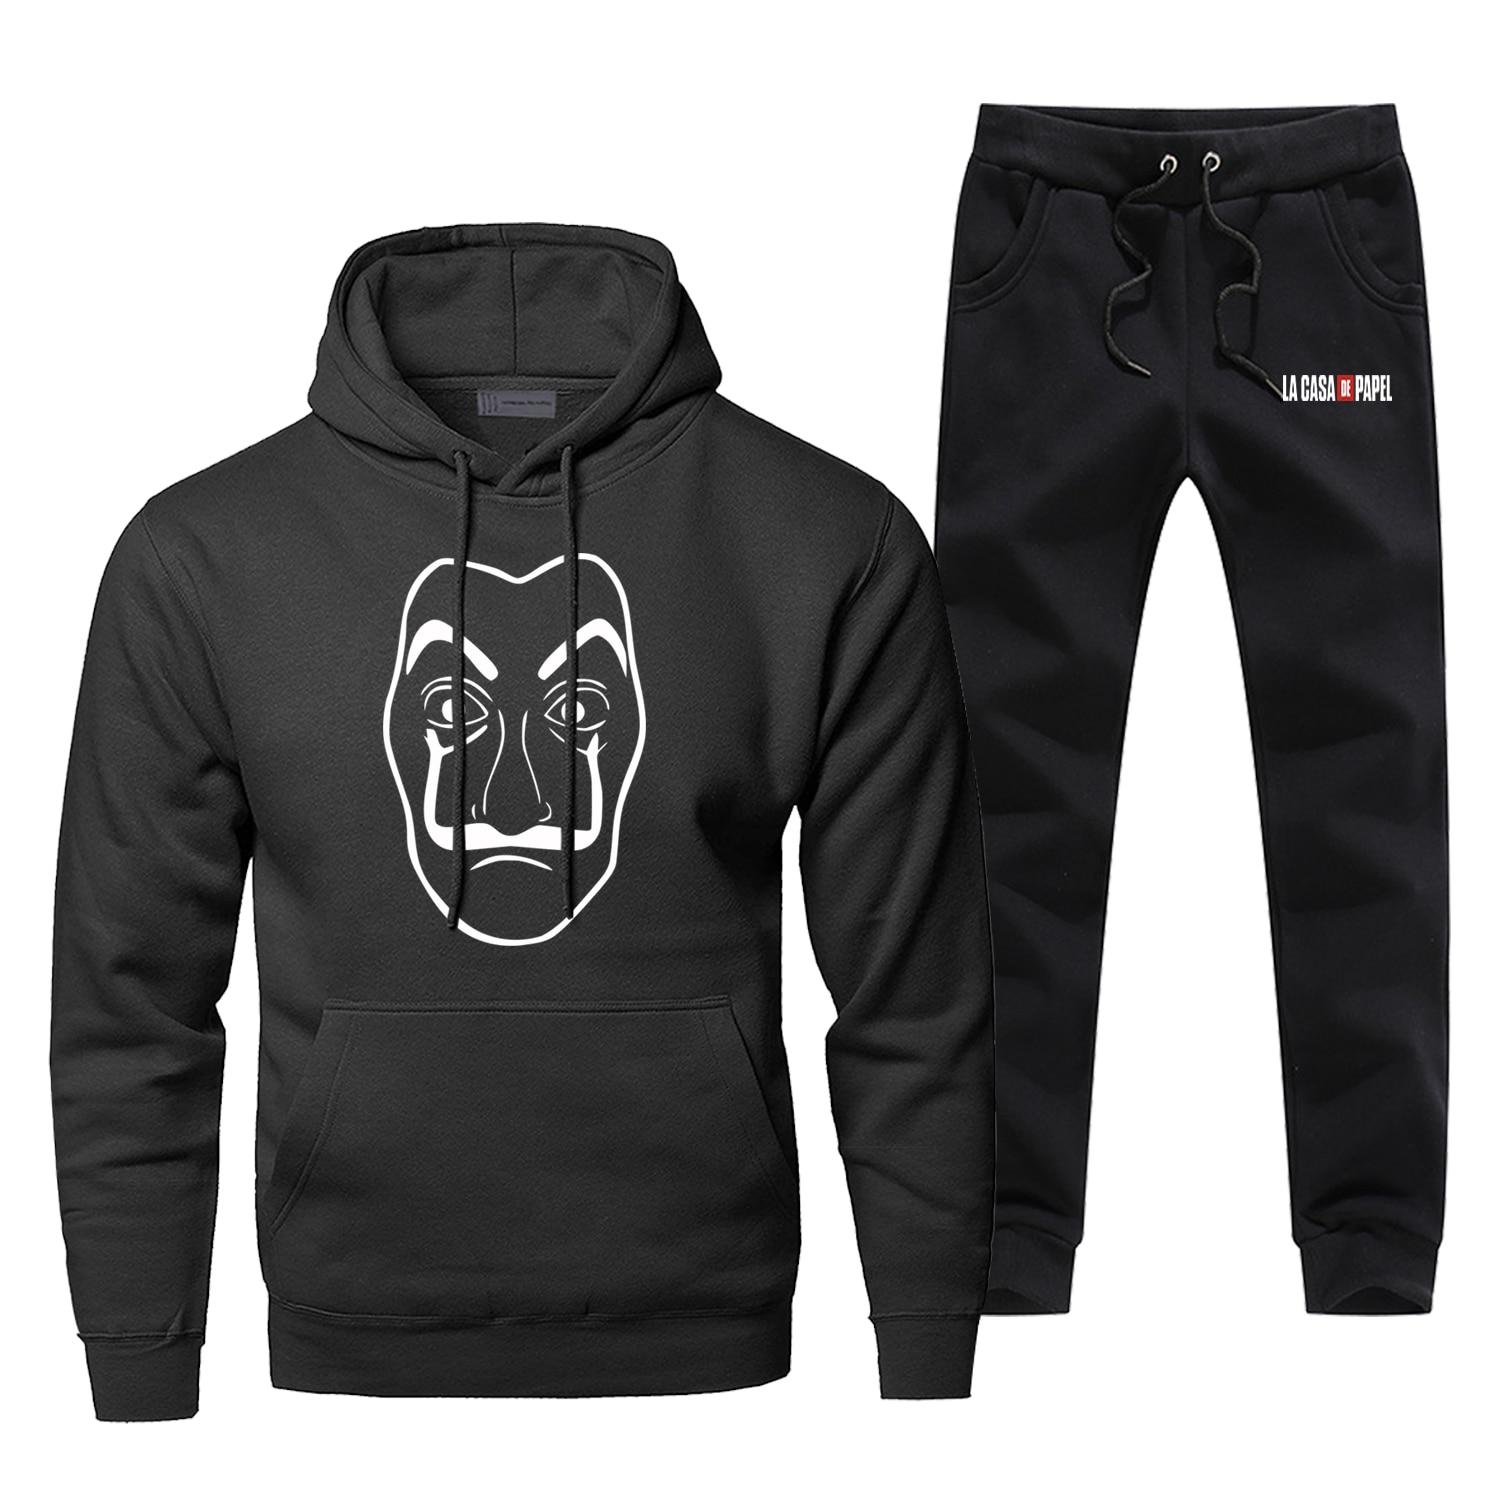 La Casa De Papel Mens Hoodies Sets Two Piece Pant Hoodie Sweatshirt Sweatpants Professor Sergio Marquina Sportswear Sweatshirts